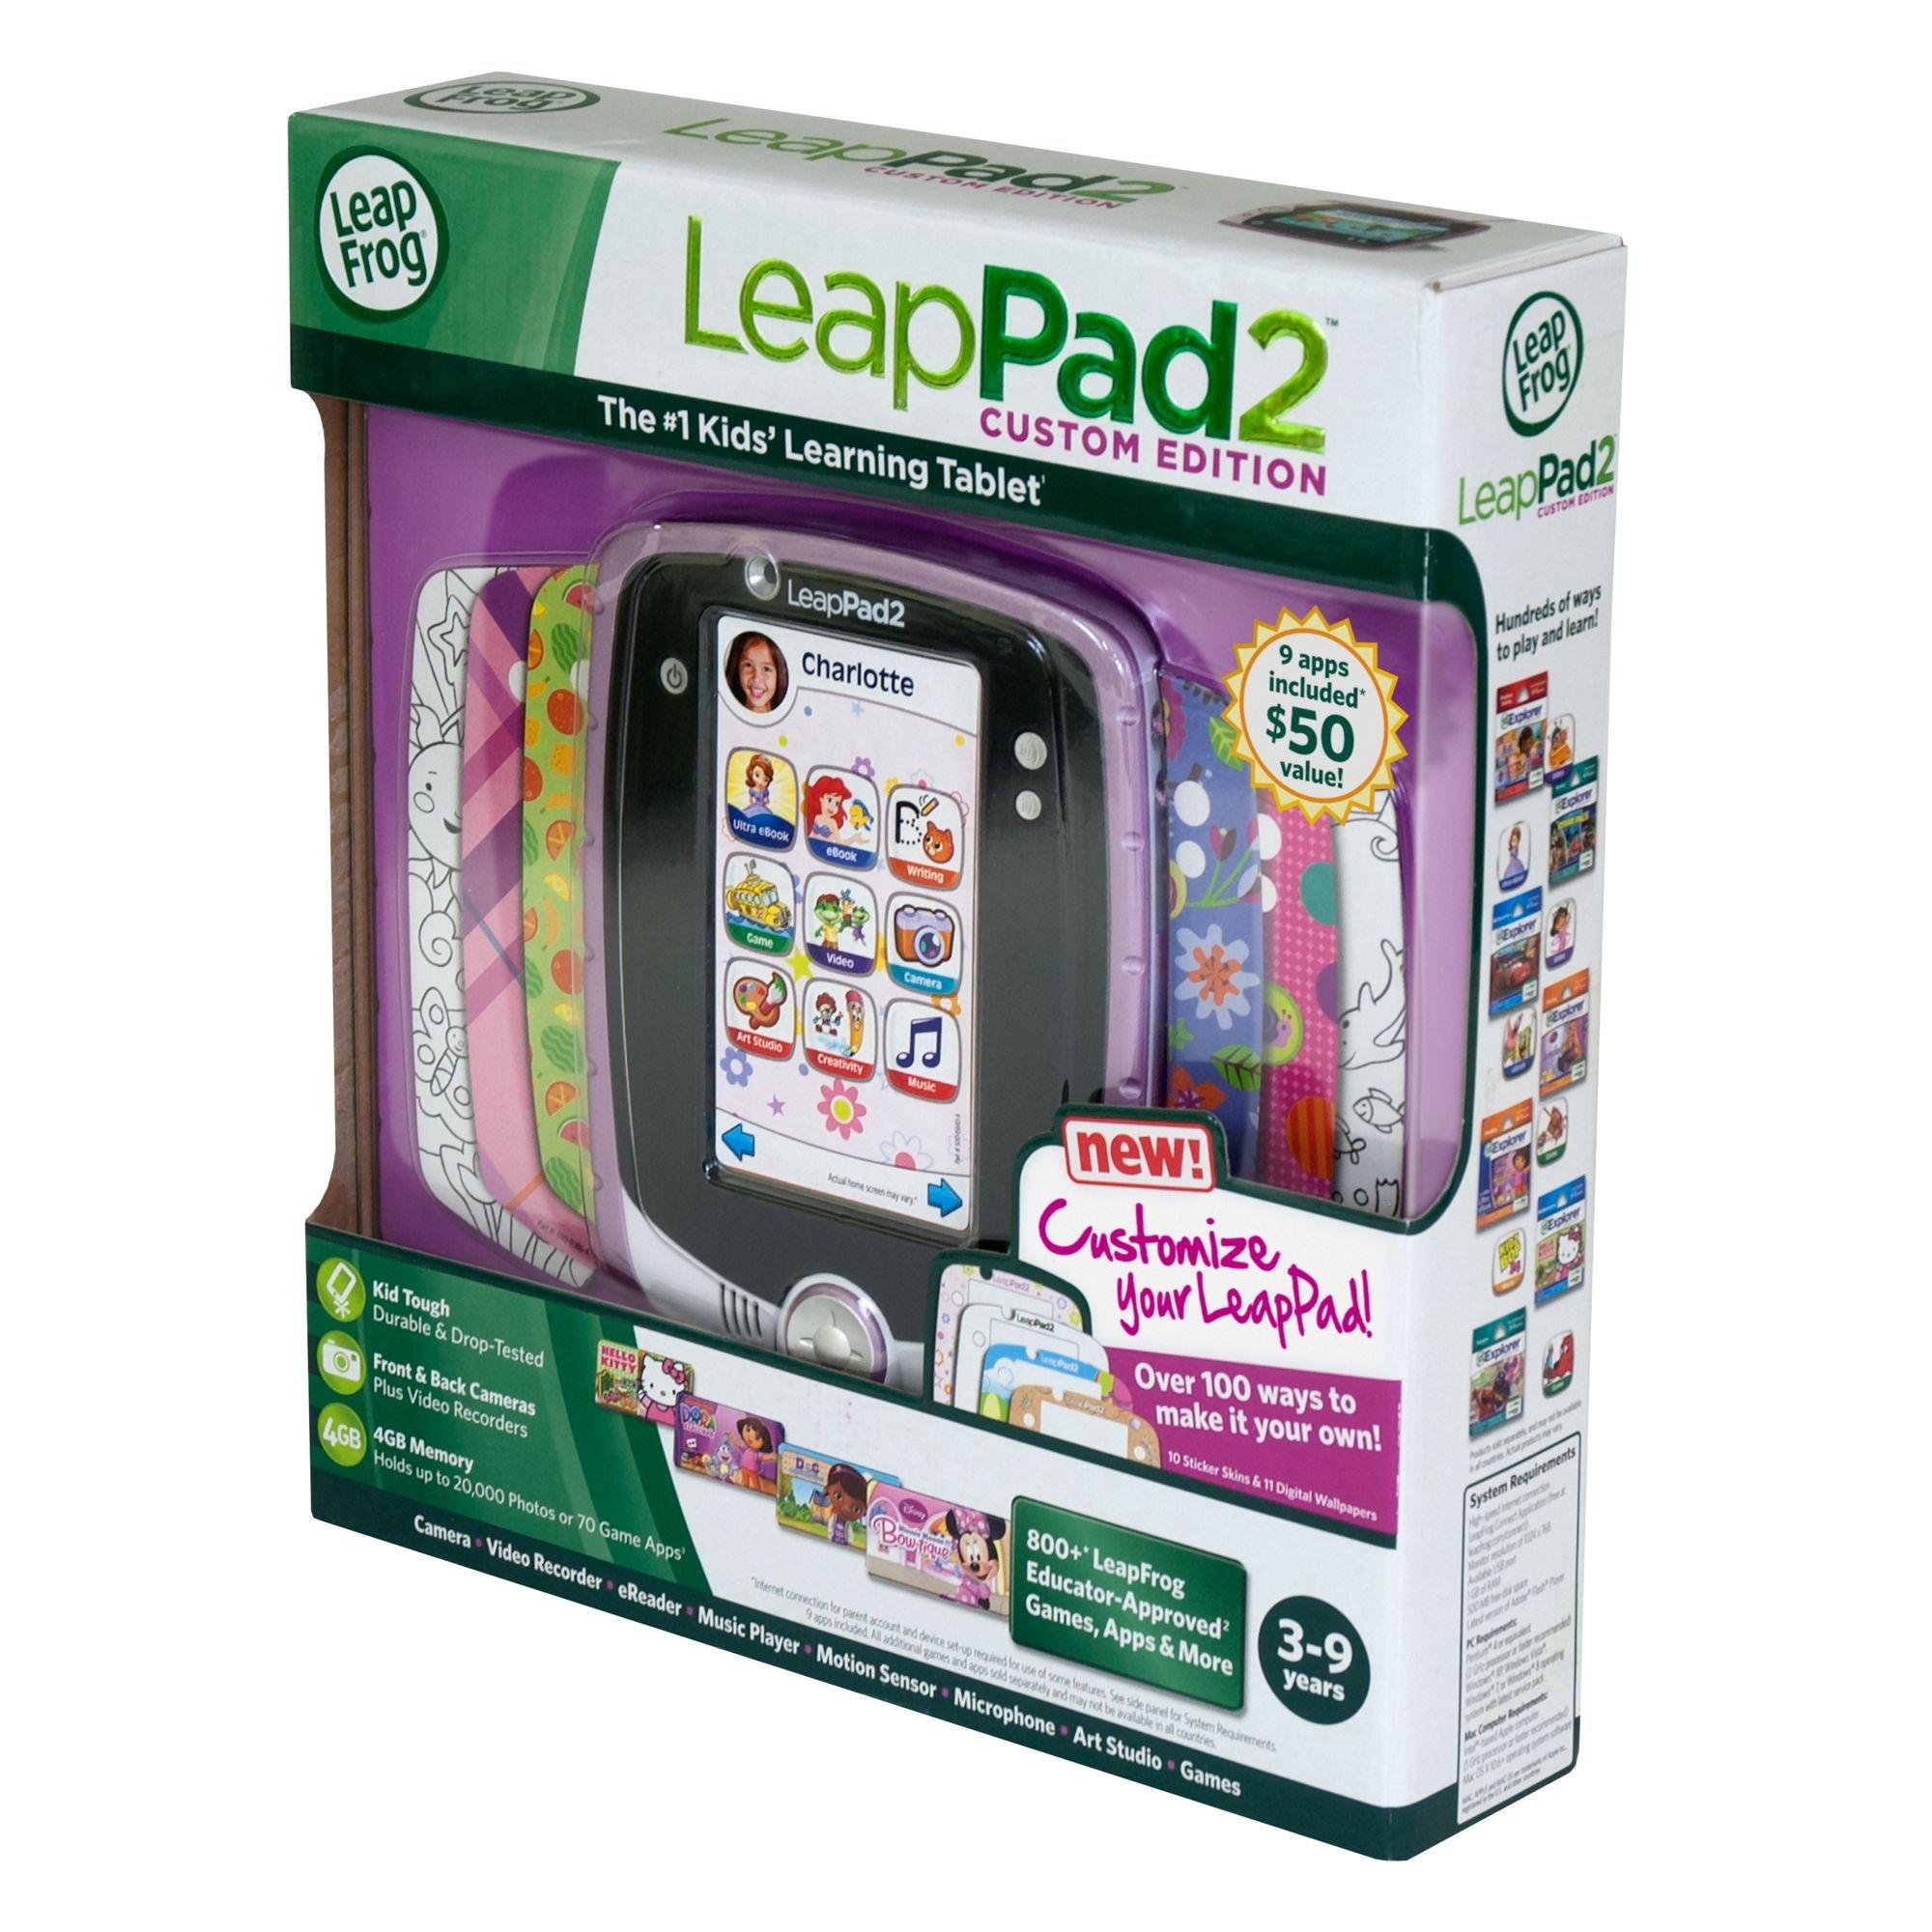 LeapFrog LeapPad2 Kids' Learning Tablet (Custom Edition), Pink by LeapFrog (Image #9)